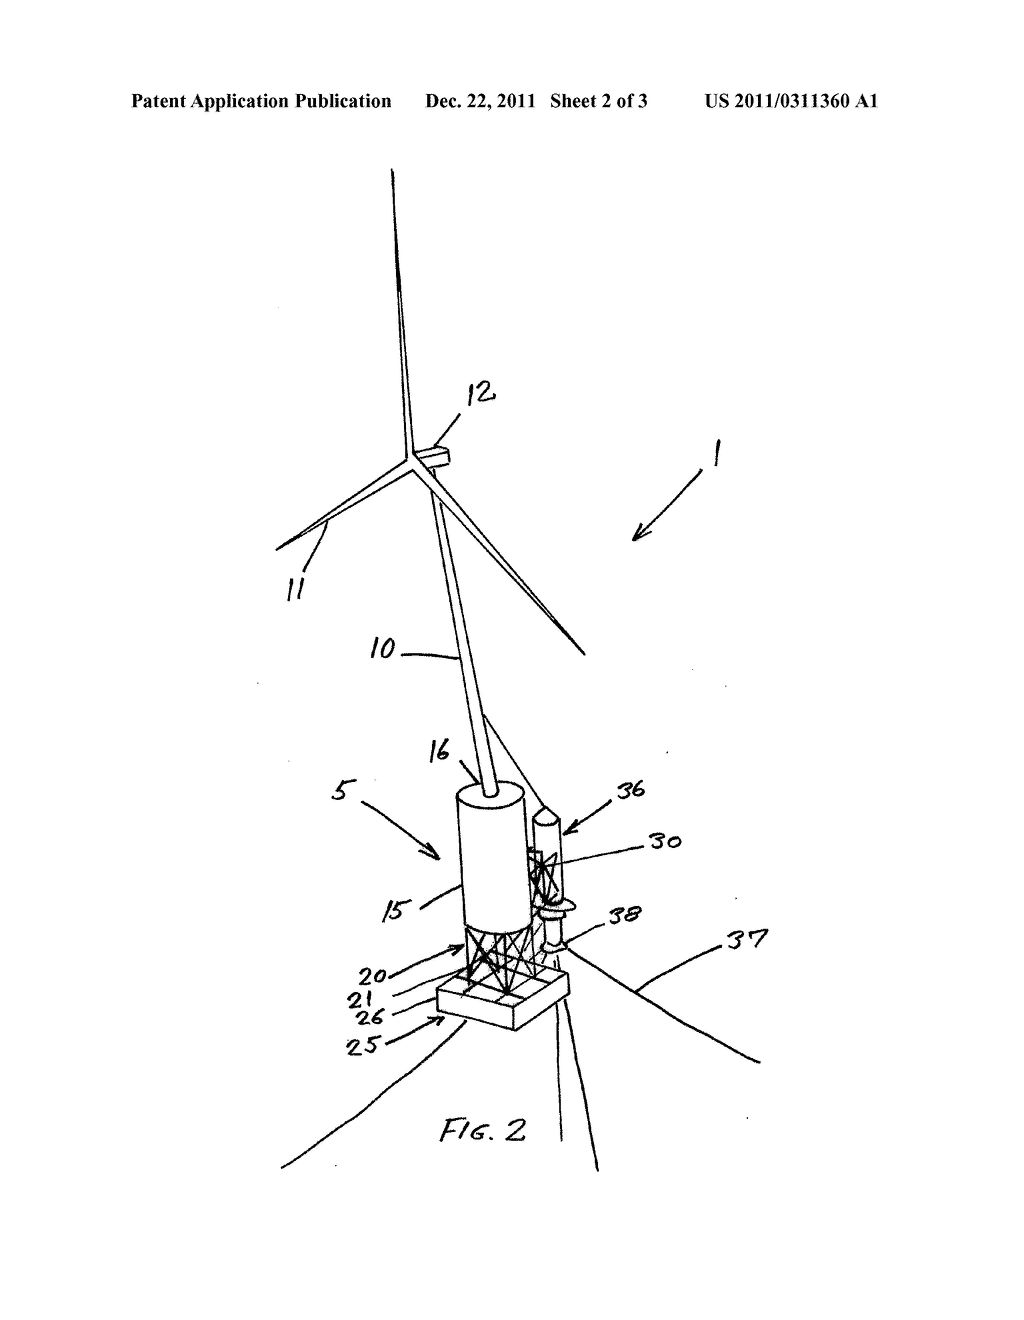 Offshore Wind Turbine Diagram Offshore Wind Turbine